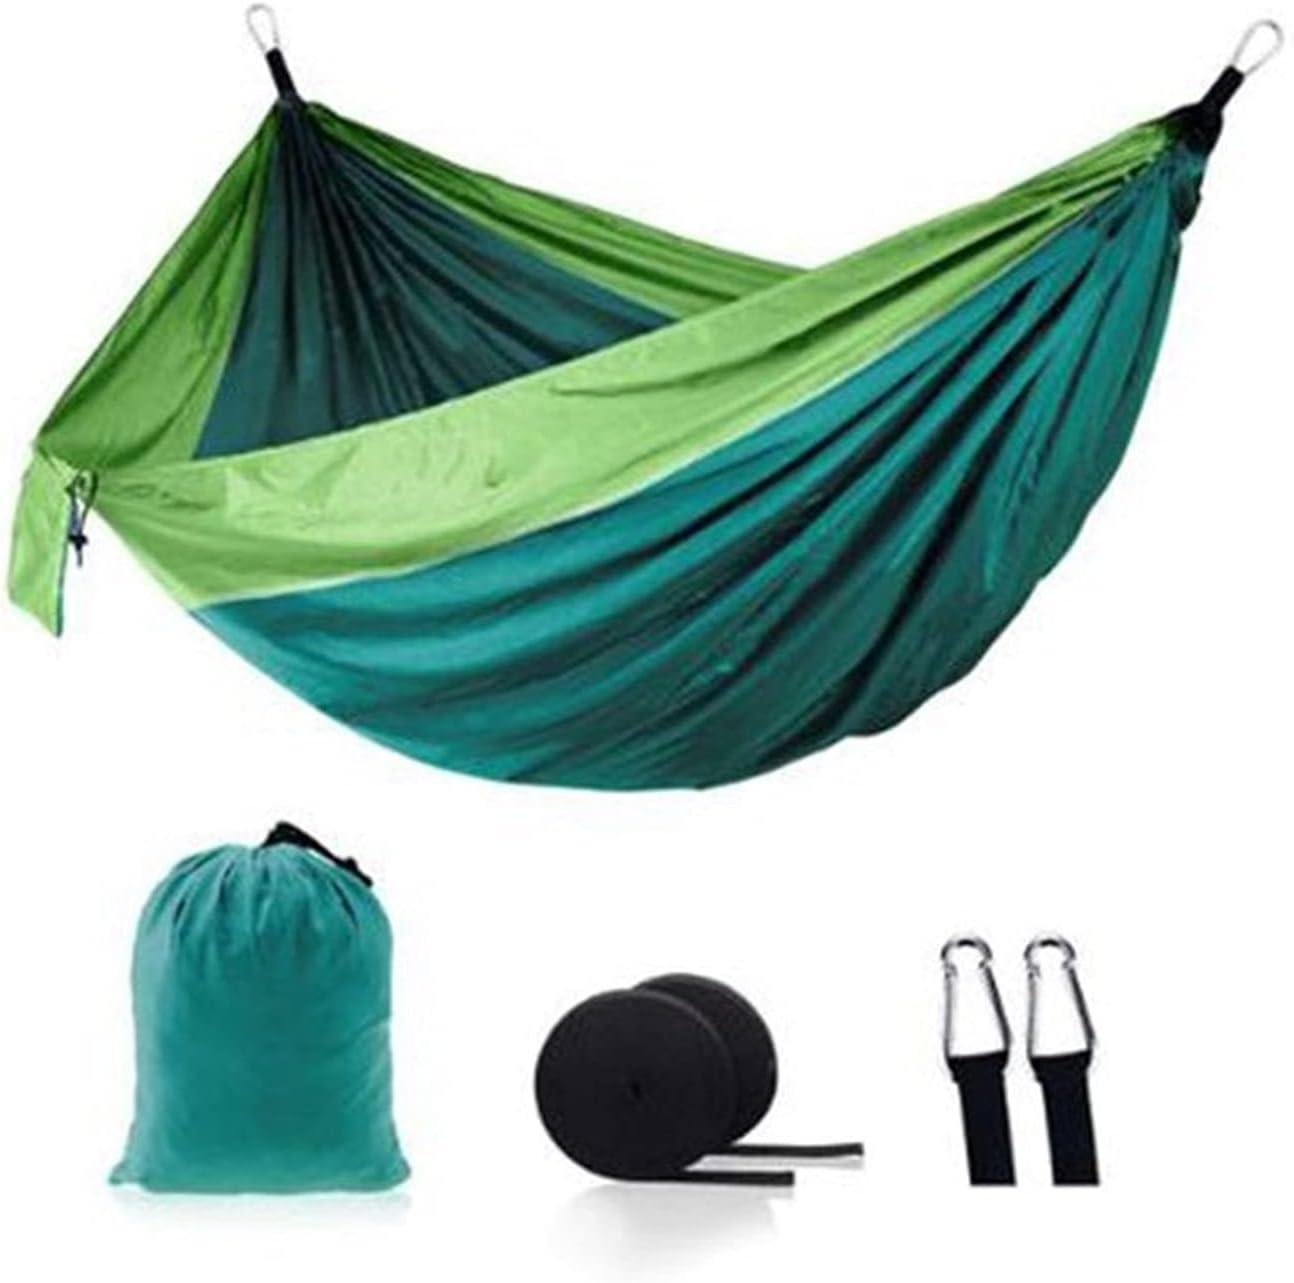 GDYJP Camping Hammock Portable Nylon Sales results No. 1 Wa 100% quality warranty Ultralight Swing